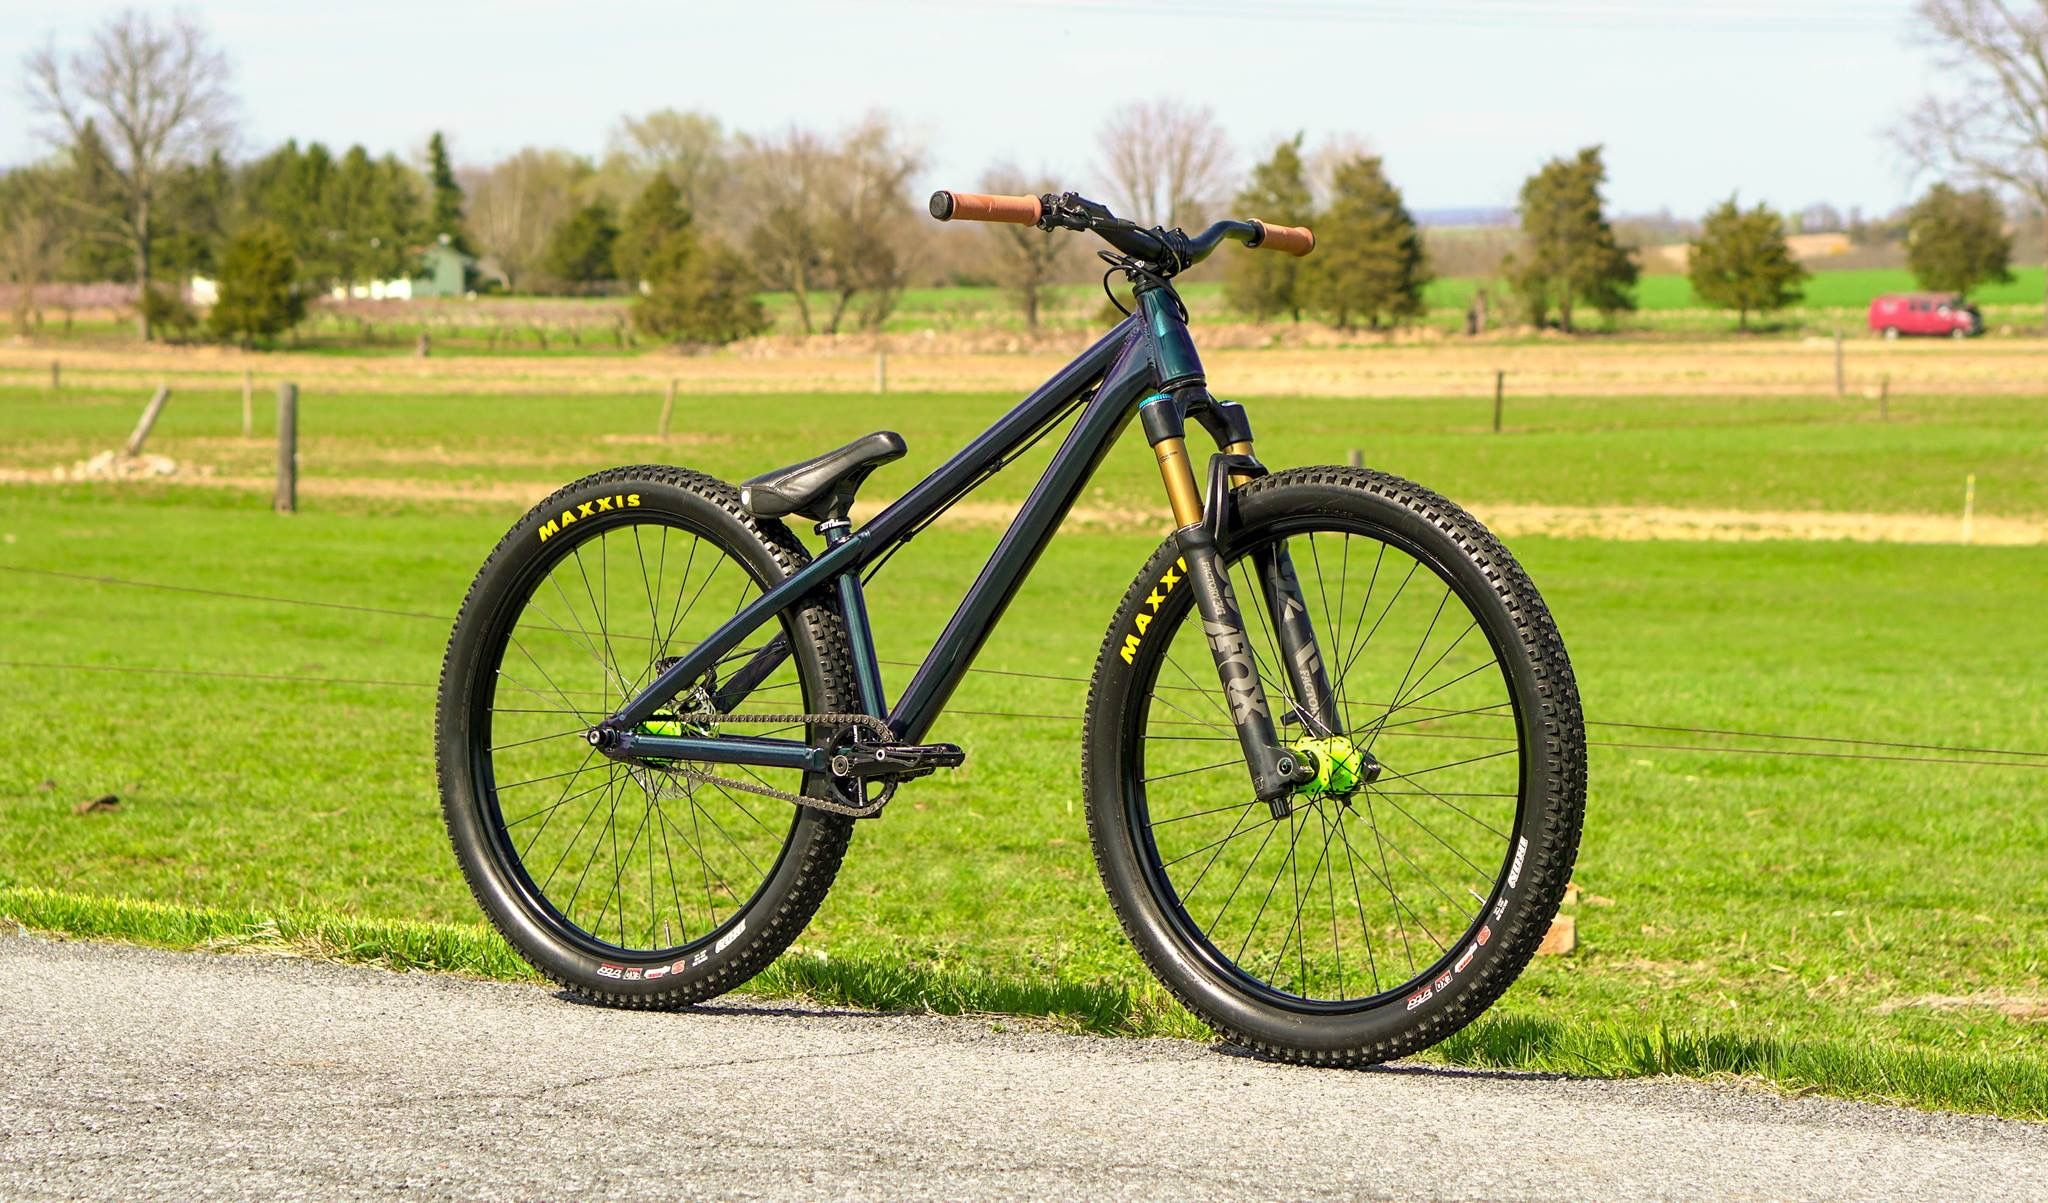 Pedbikes Dj Bmx Dirt Moutain Bike Downhill Bike